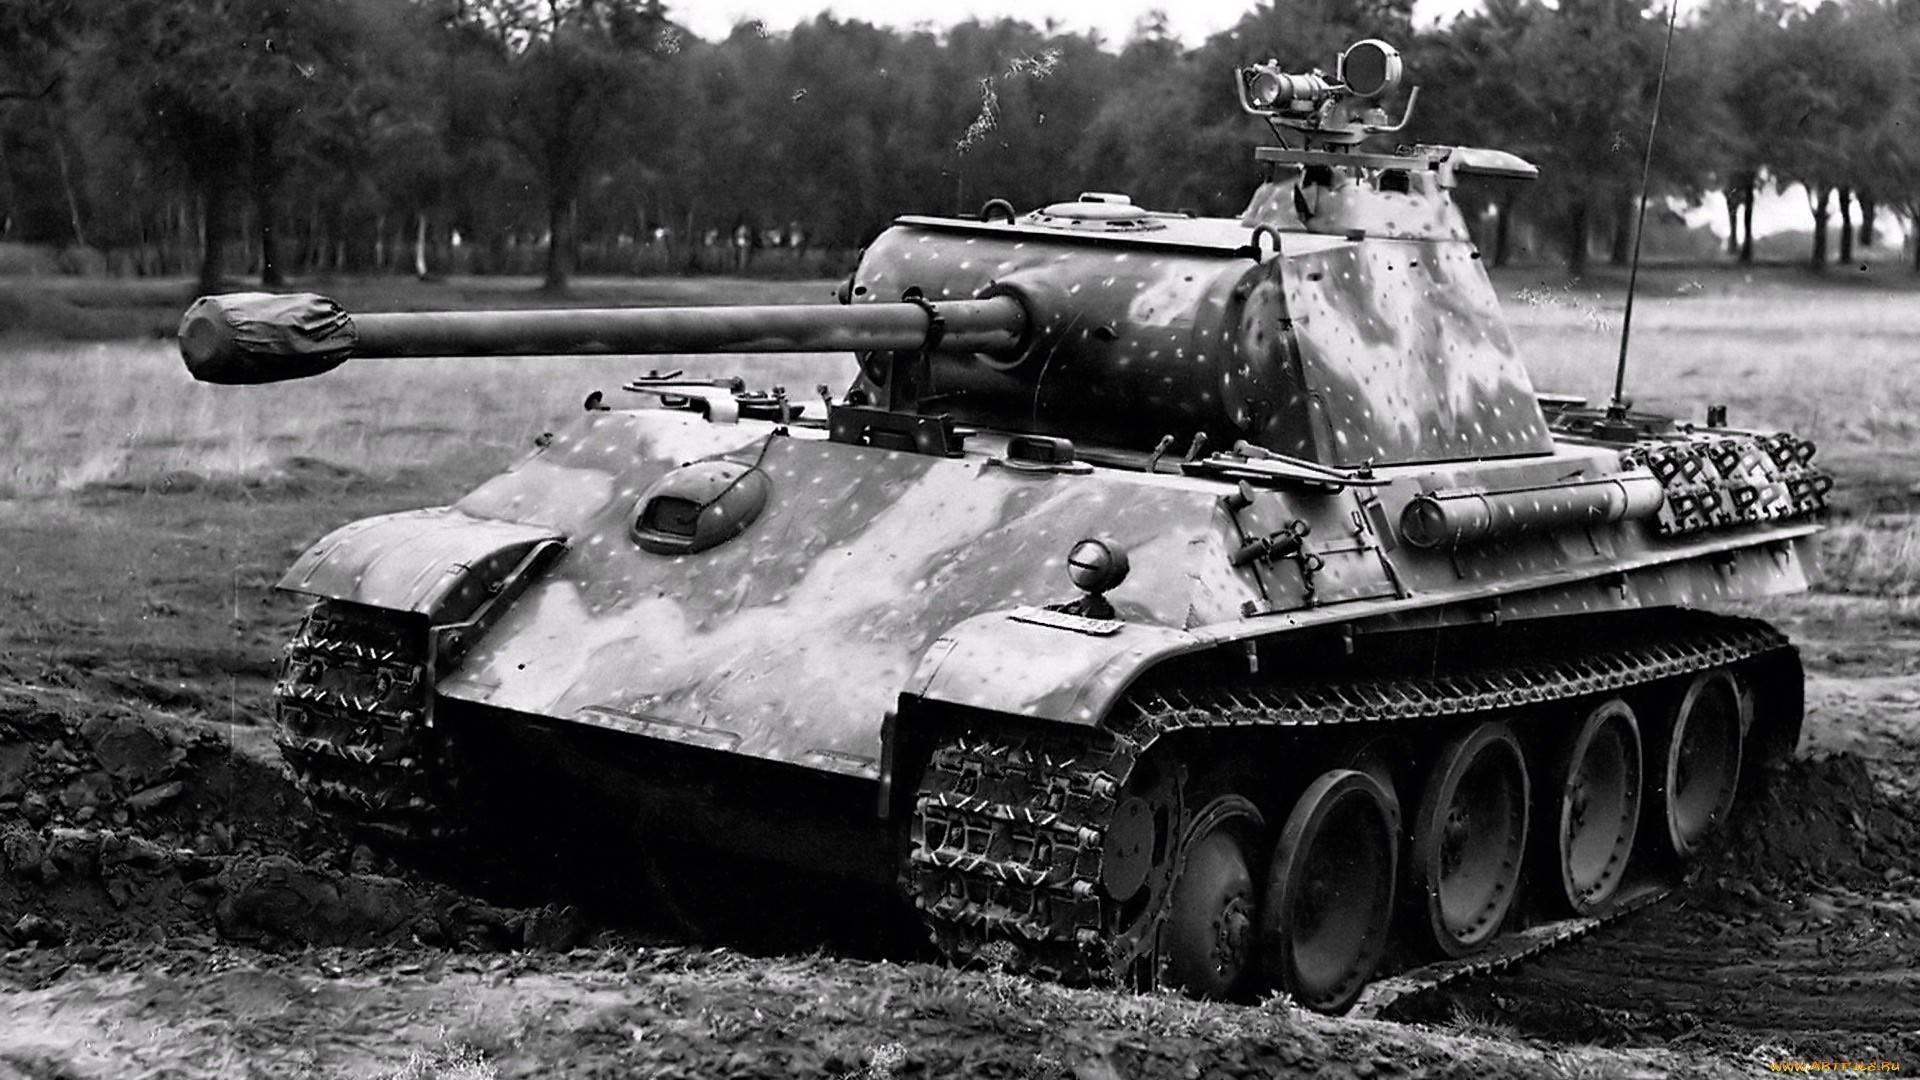 Panther mit 8,8 cm l/71 - обзор, гайд, вики, советы для среднего танка panther mit 8,8 cm l/71 из игры вот на веб-ресурсе wiki.wargaming.net